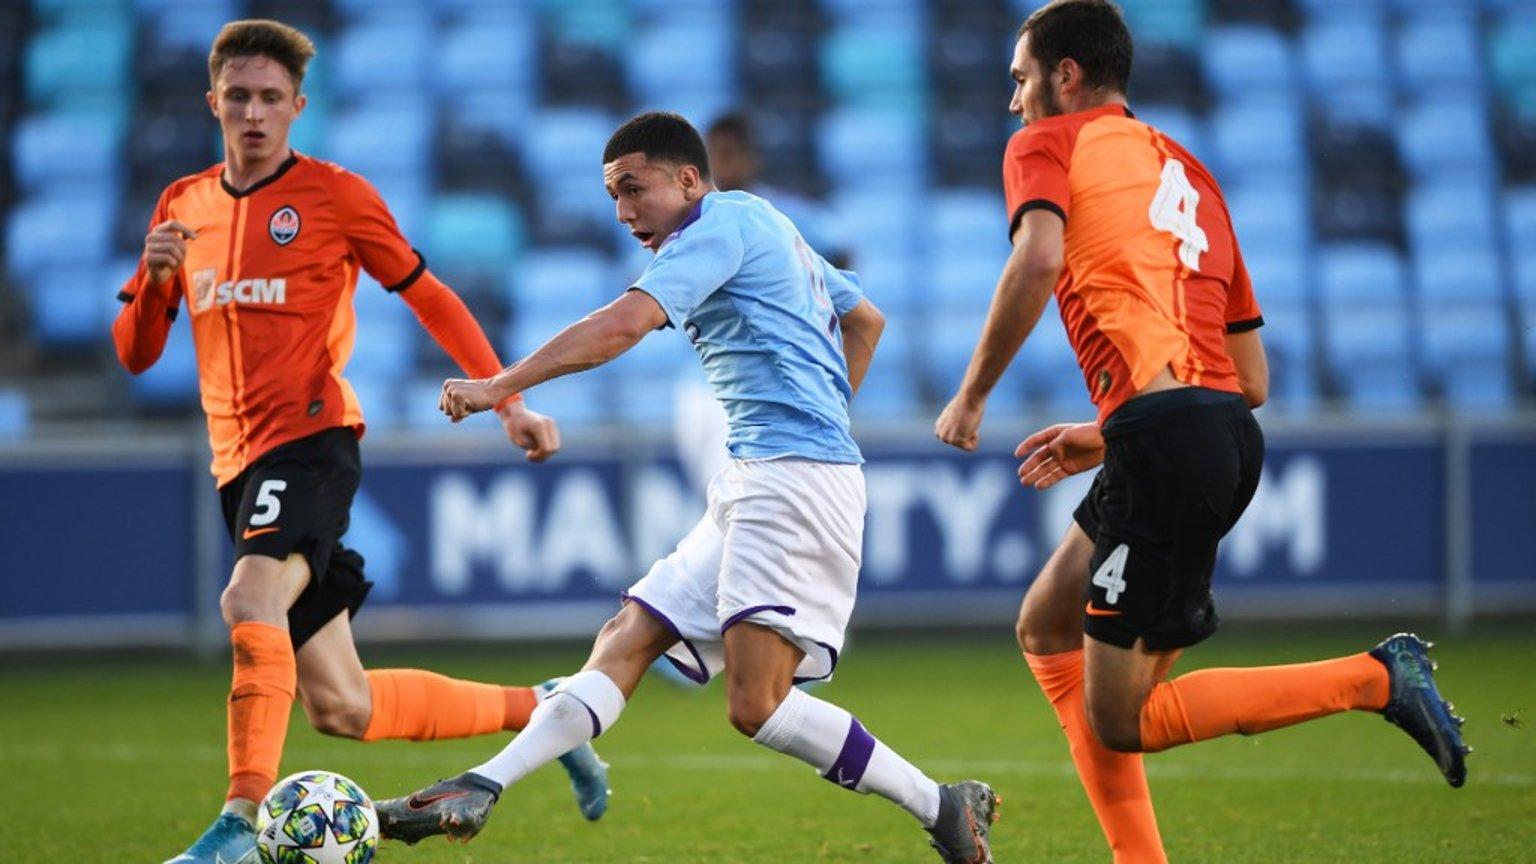 SLICK: Ian Poveda makes it 3-0 for City U19s against Shakhtar Donetsk.